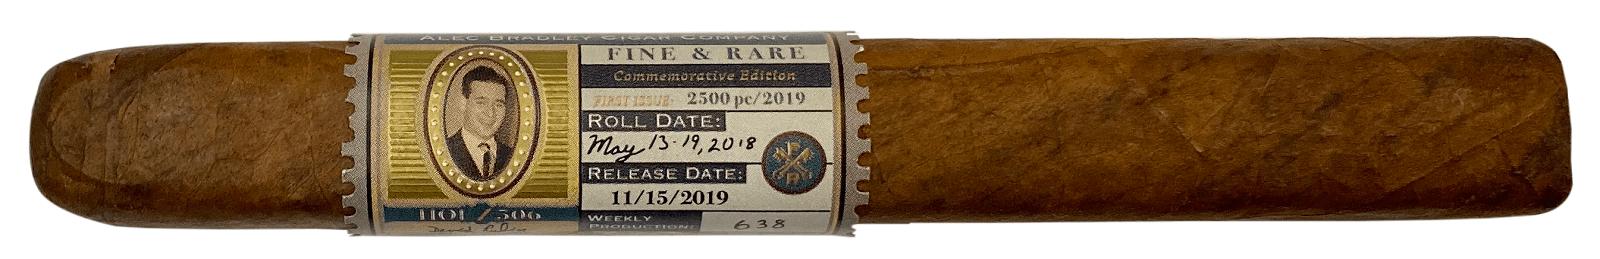 Alec Bradley Fine & Rare HOF / 506